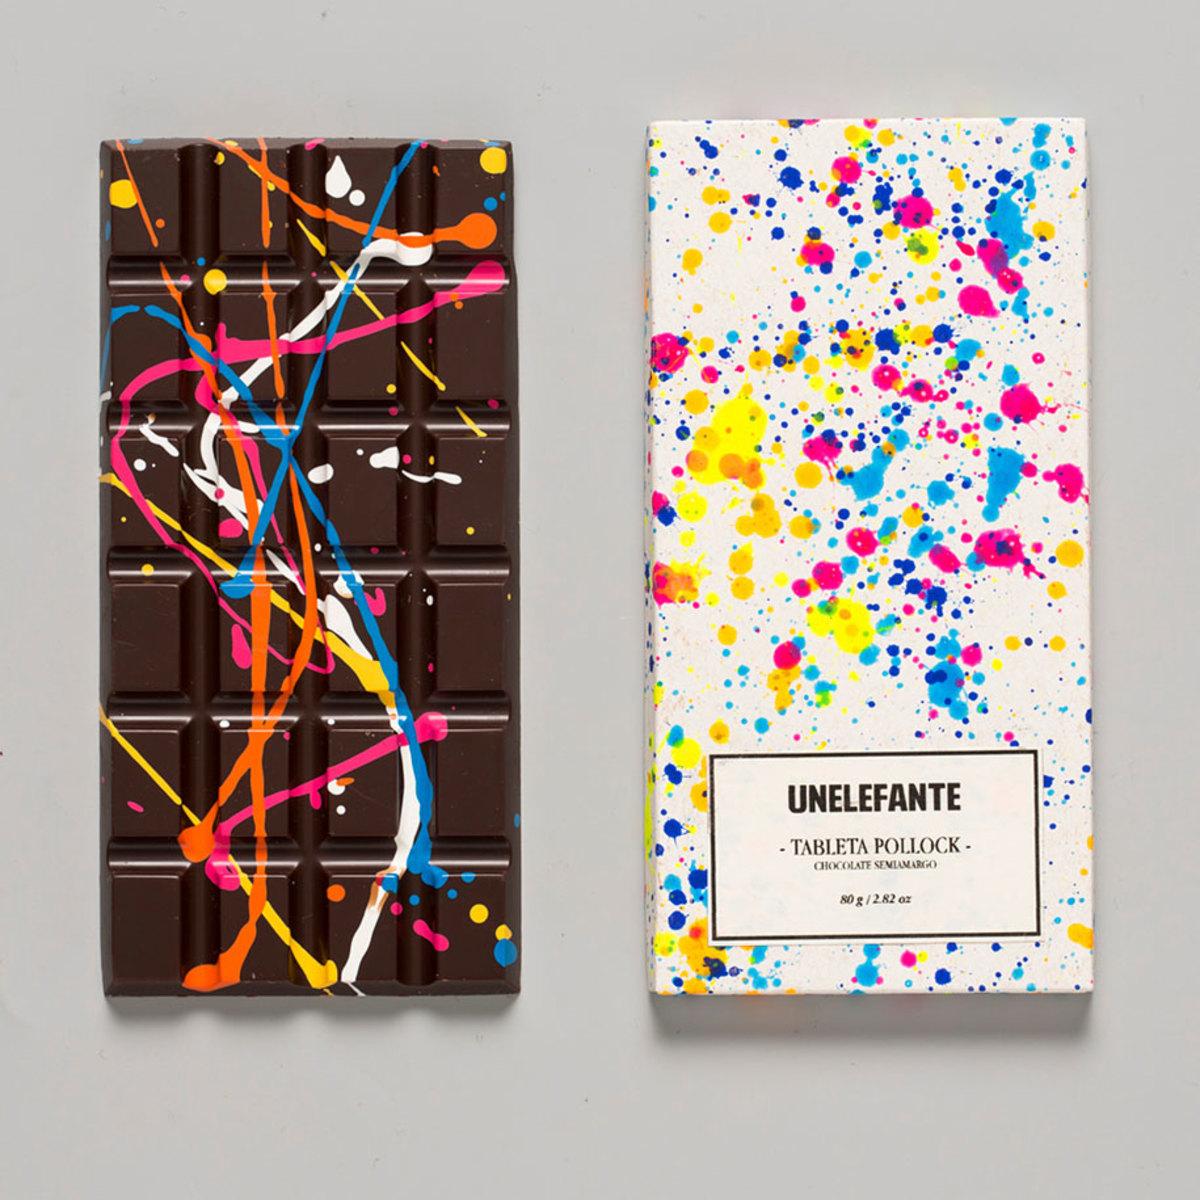 colourful-chocolate-bars-unelefante-1